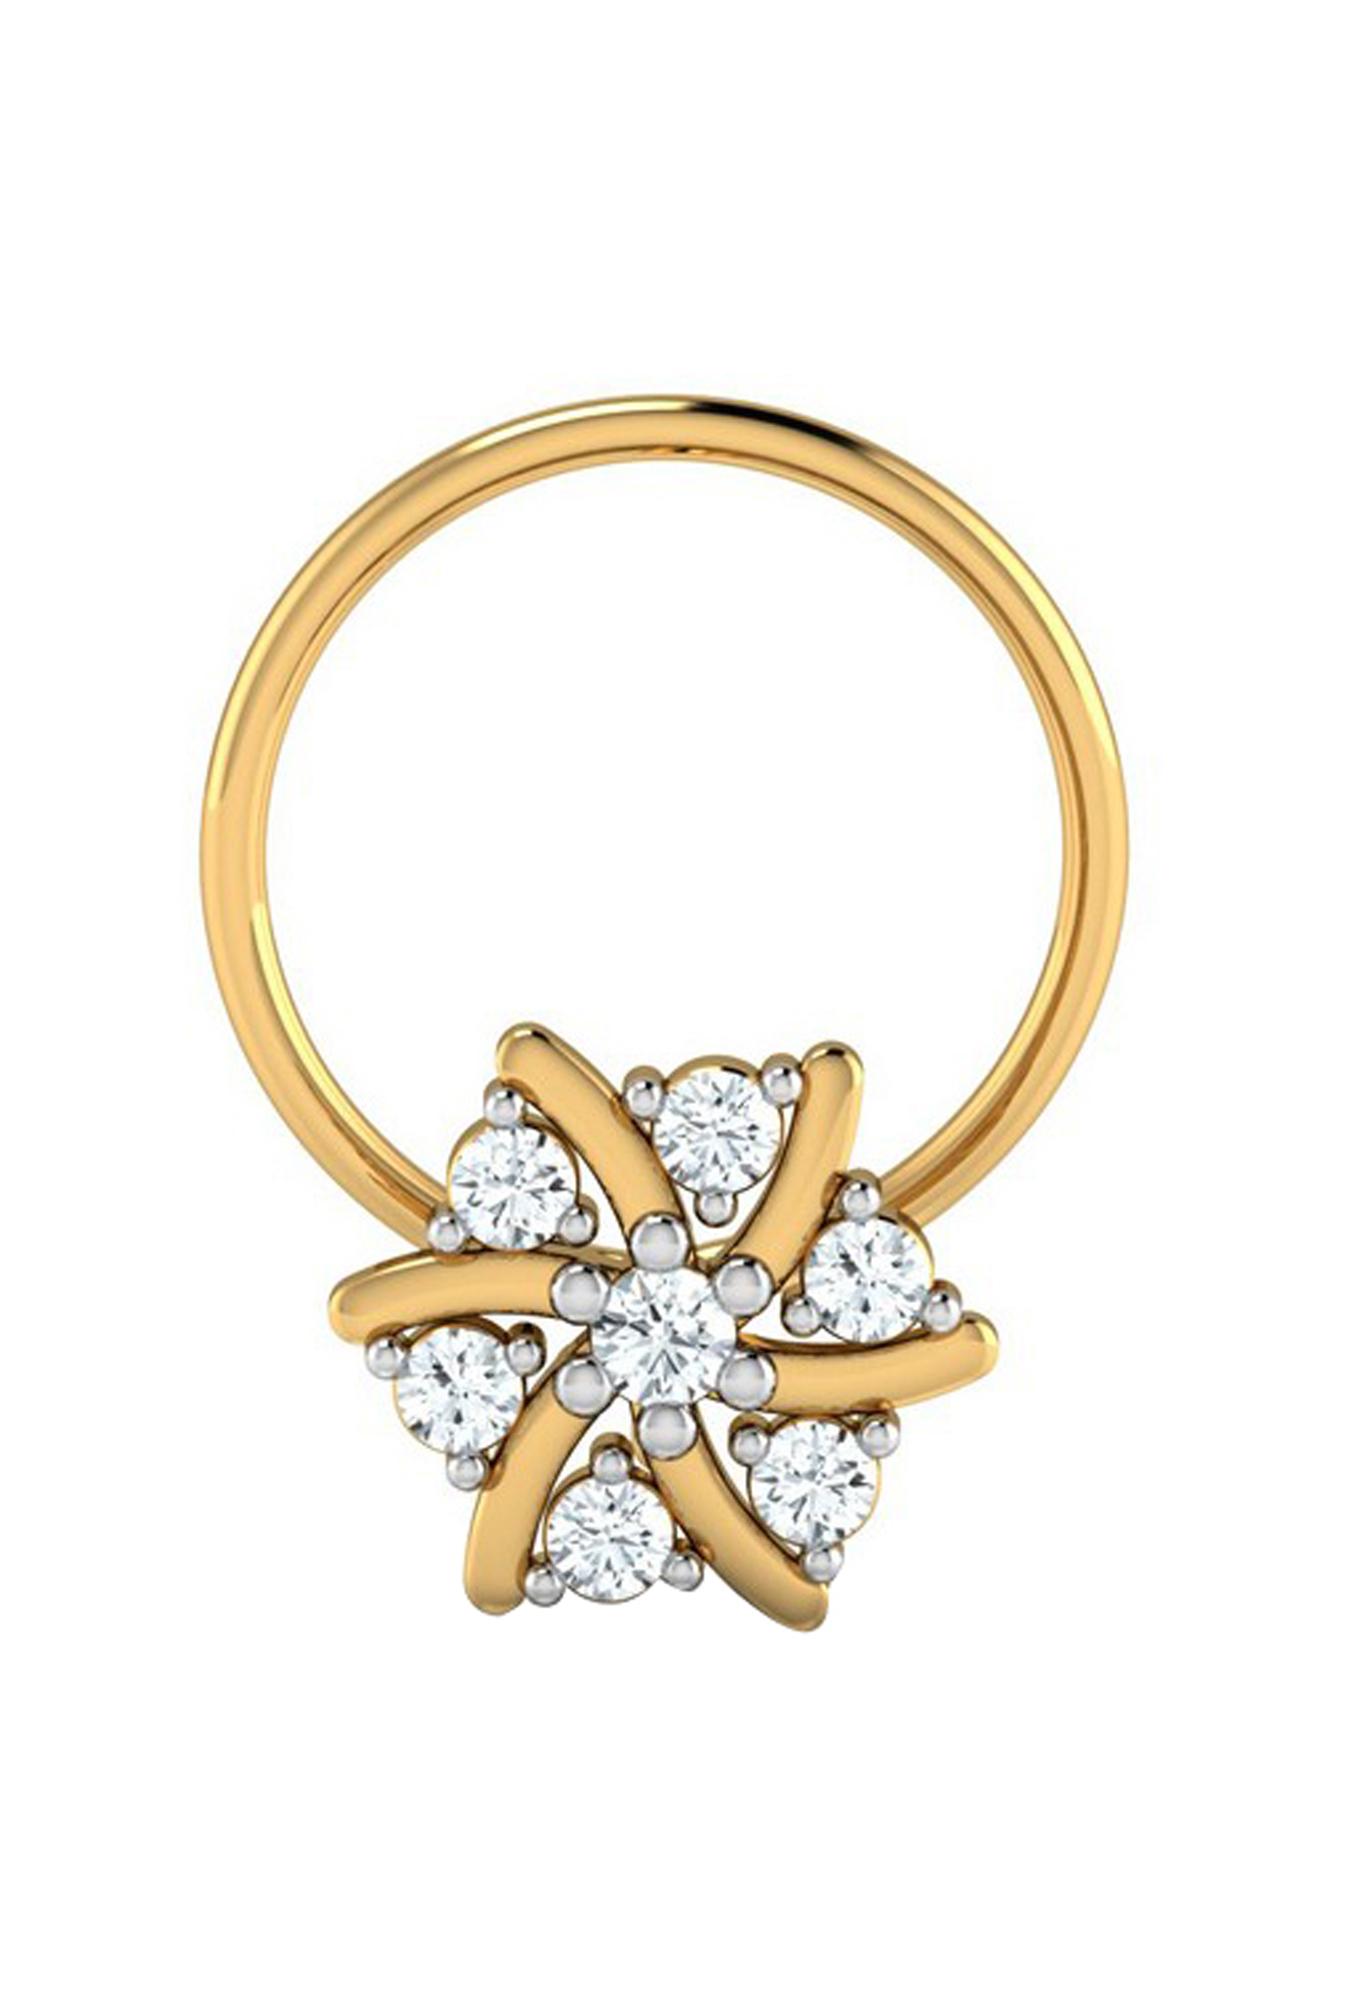 Buy Sri Jagdamba Pearls Gargi 18 Kt Gold Diamond Nosepin Online At Best Price Tata Cliq